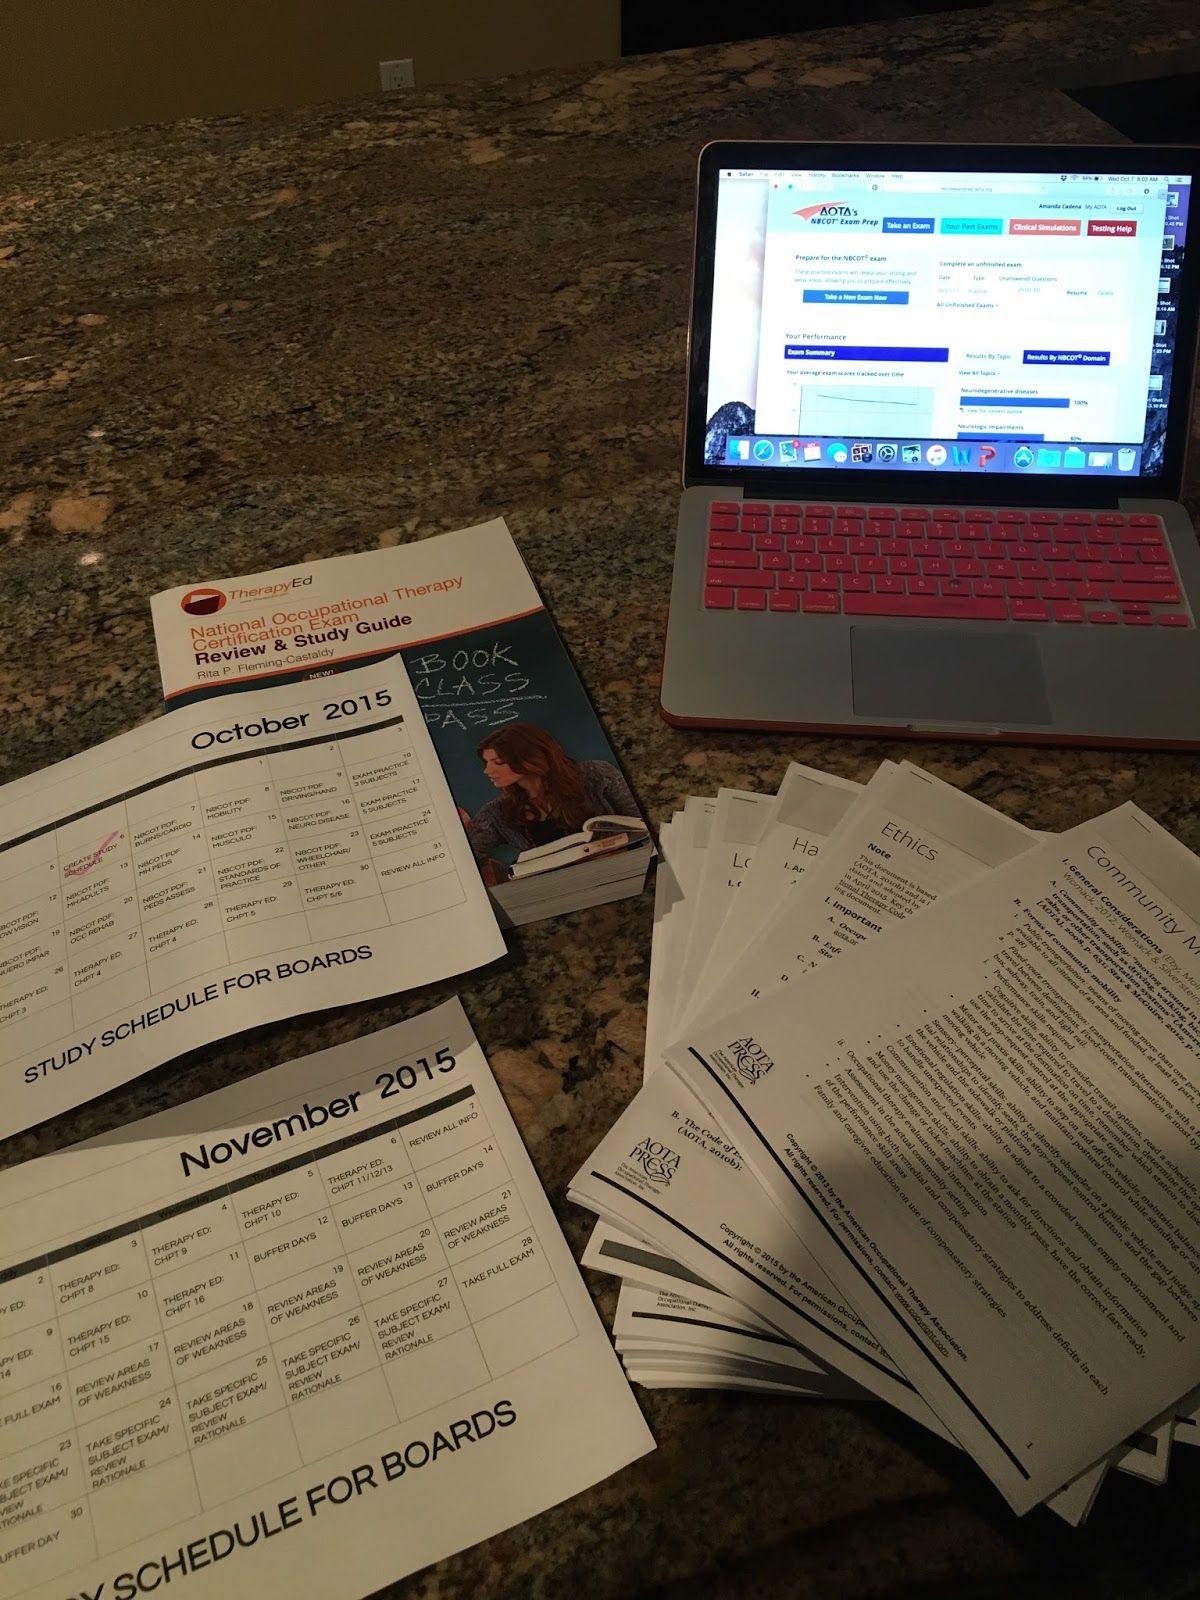 NBCOT-OTR* Exam - Study Guide Zone